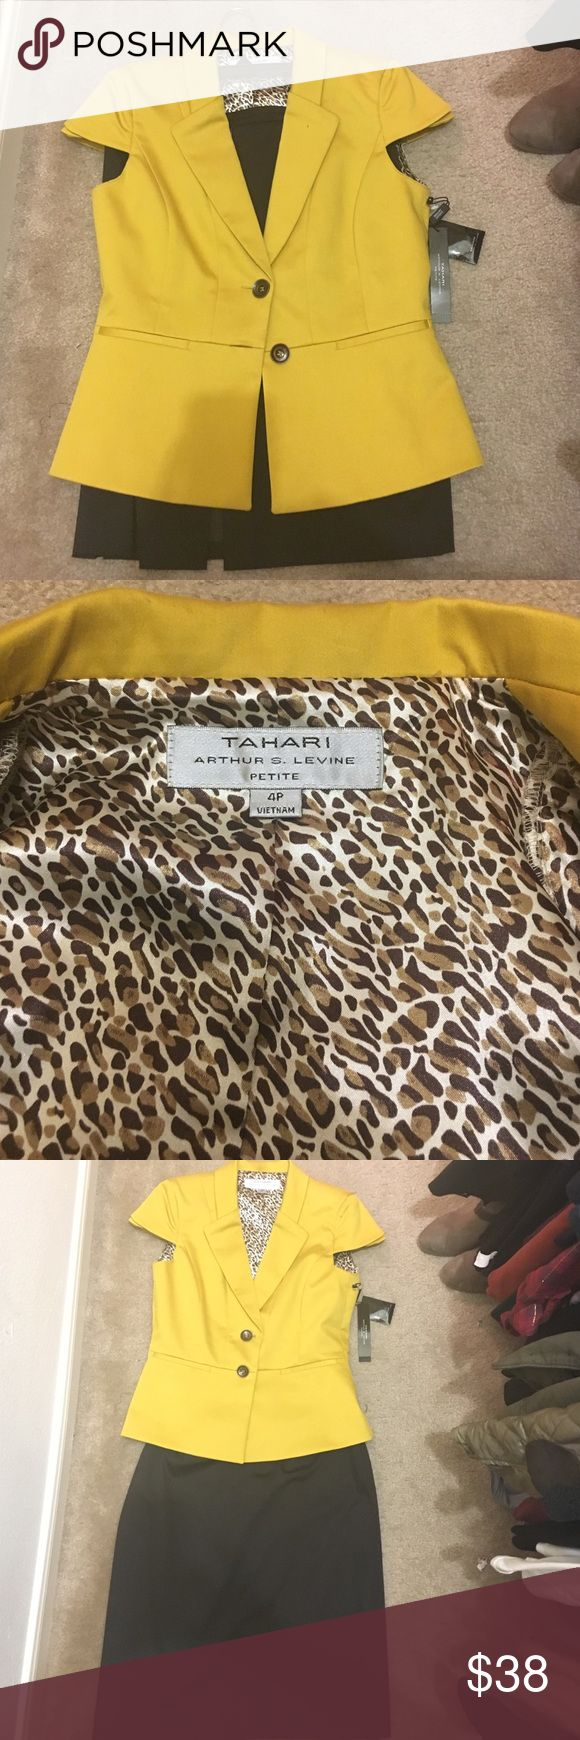 Tahari dark brown pencil skirt (two-piece suit) Brand new Tahari business suit - work attire, classic dark brown skirt and fitted short sleeve jacket Tahari Other